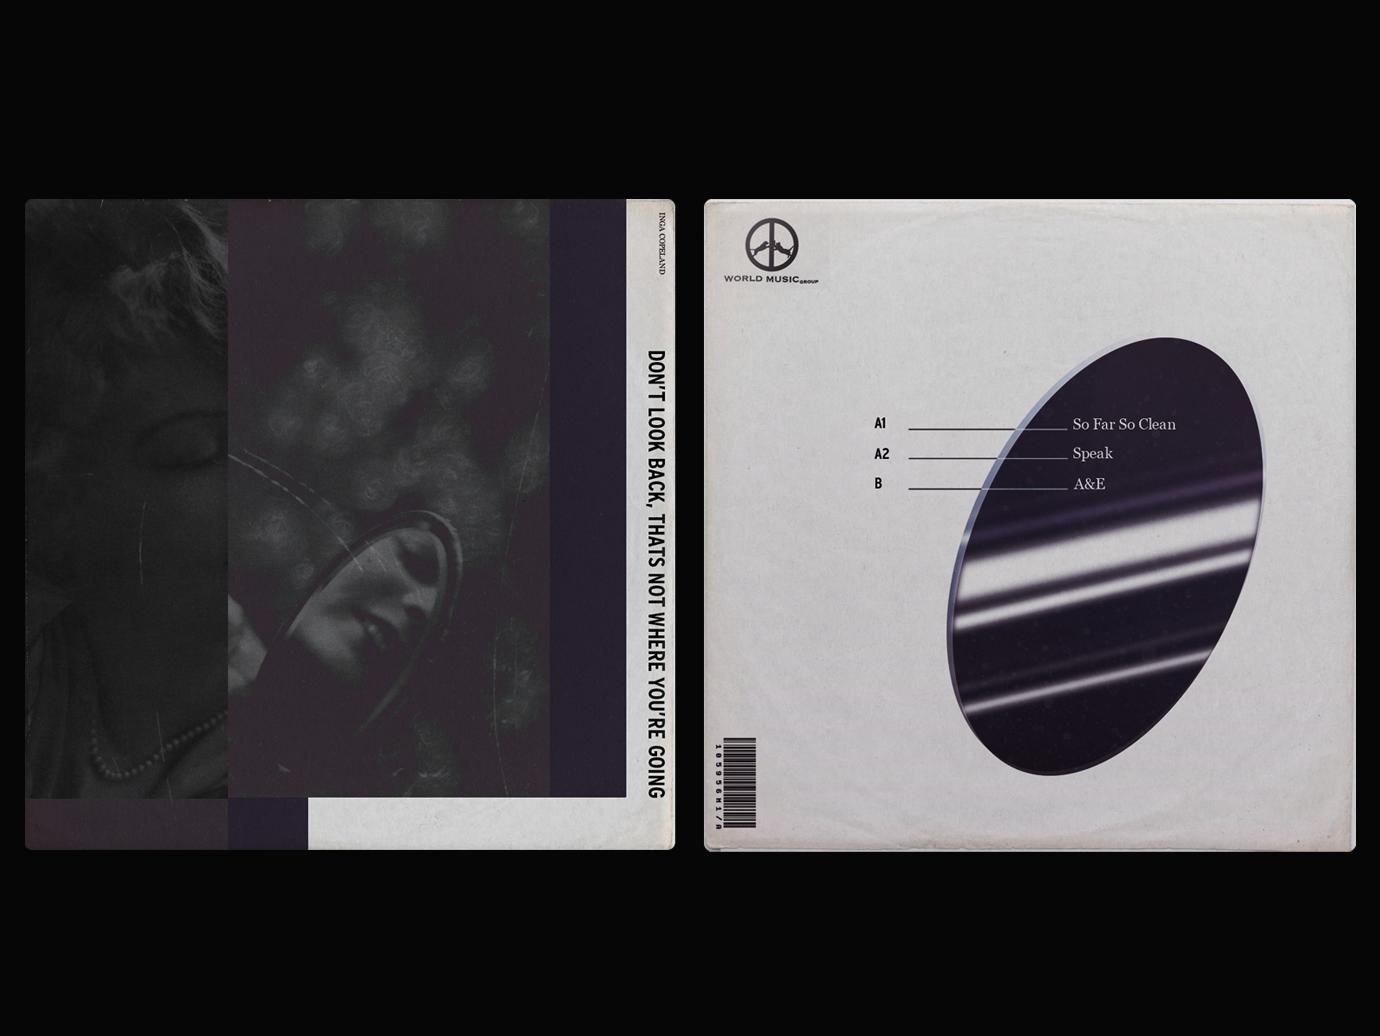 Alternative vinyl cover music minimalist contemporary graphicdesgin graphic design cover vinyl